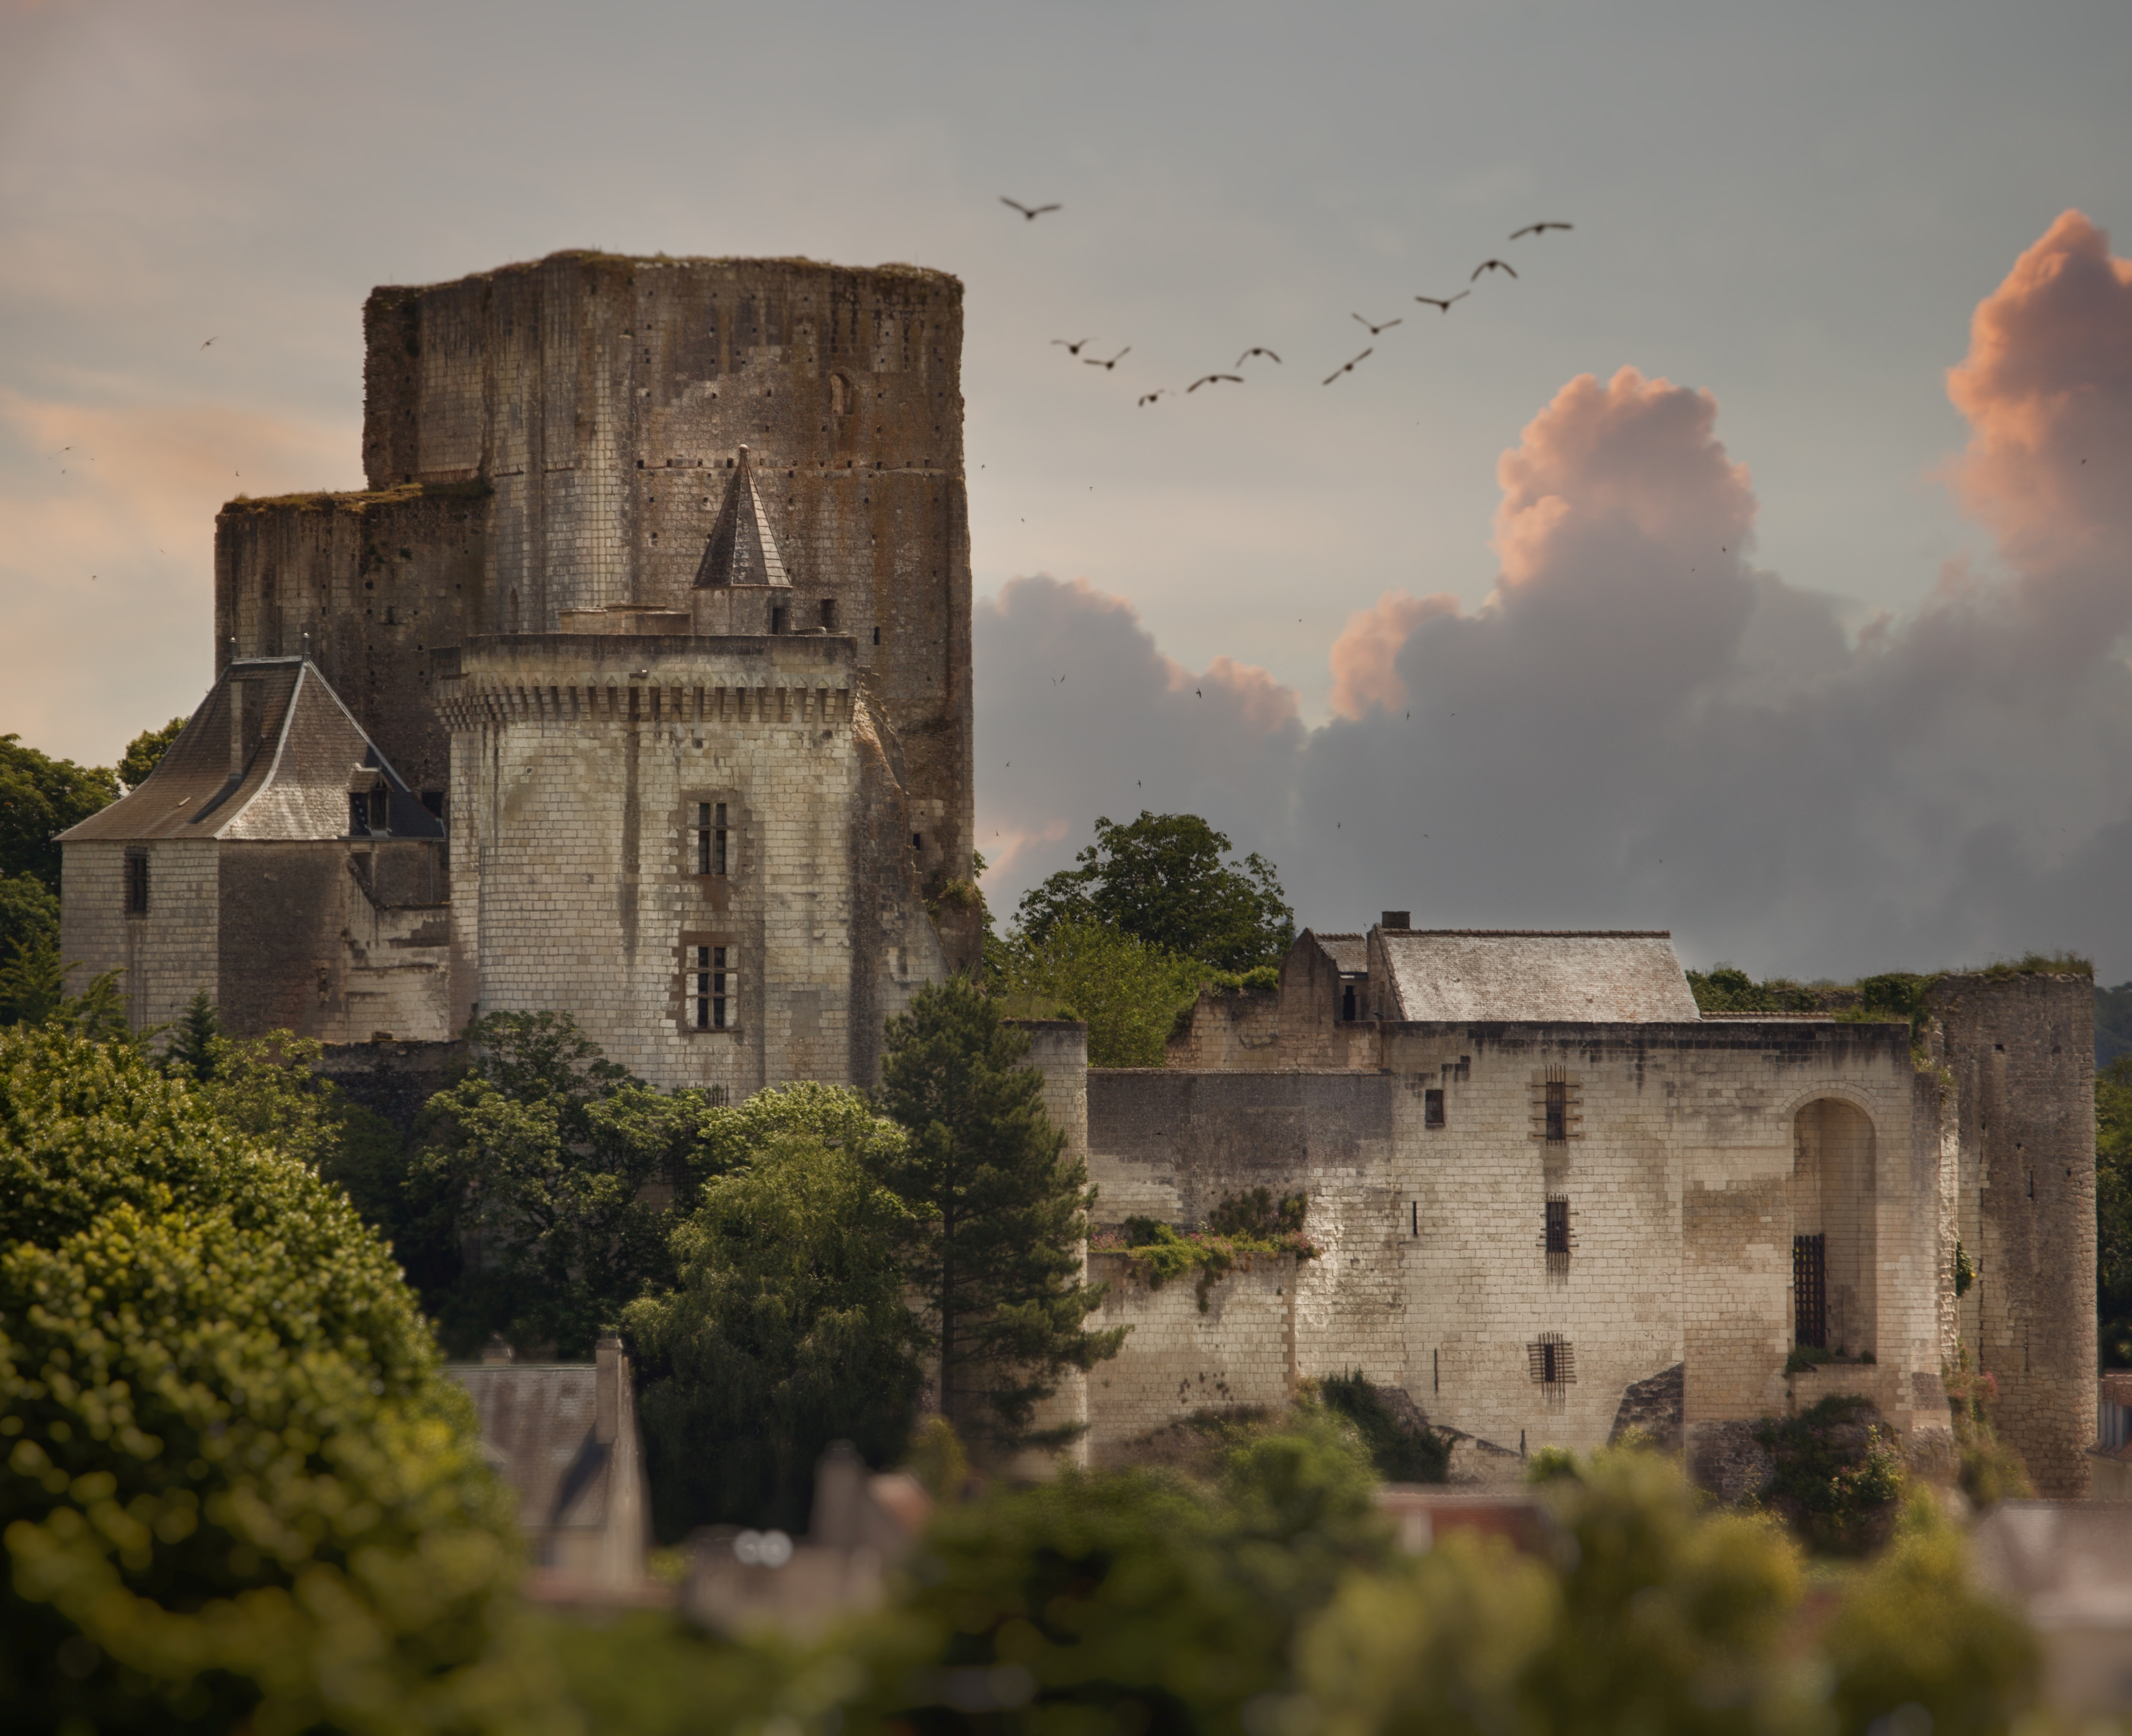 Donjon de la Forteresse Royale de Loches © Chanel Koel